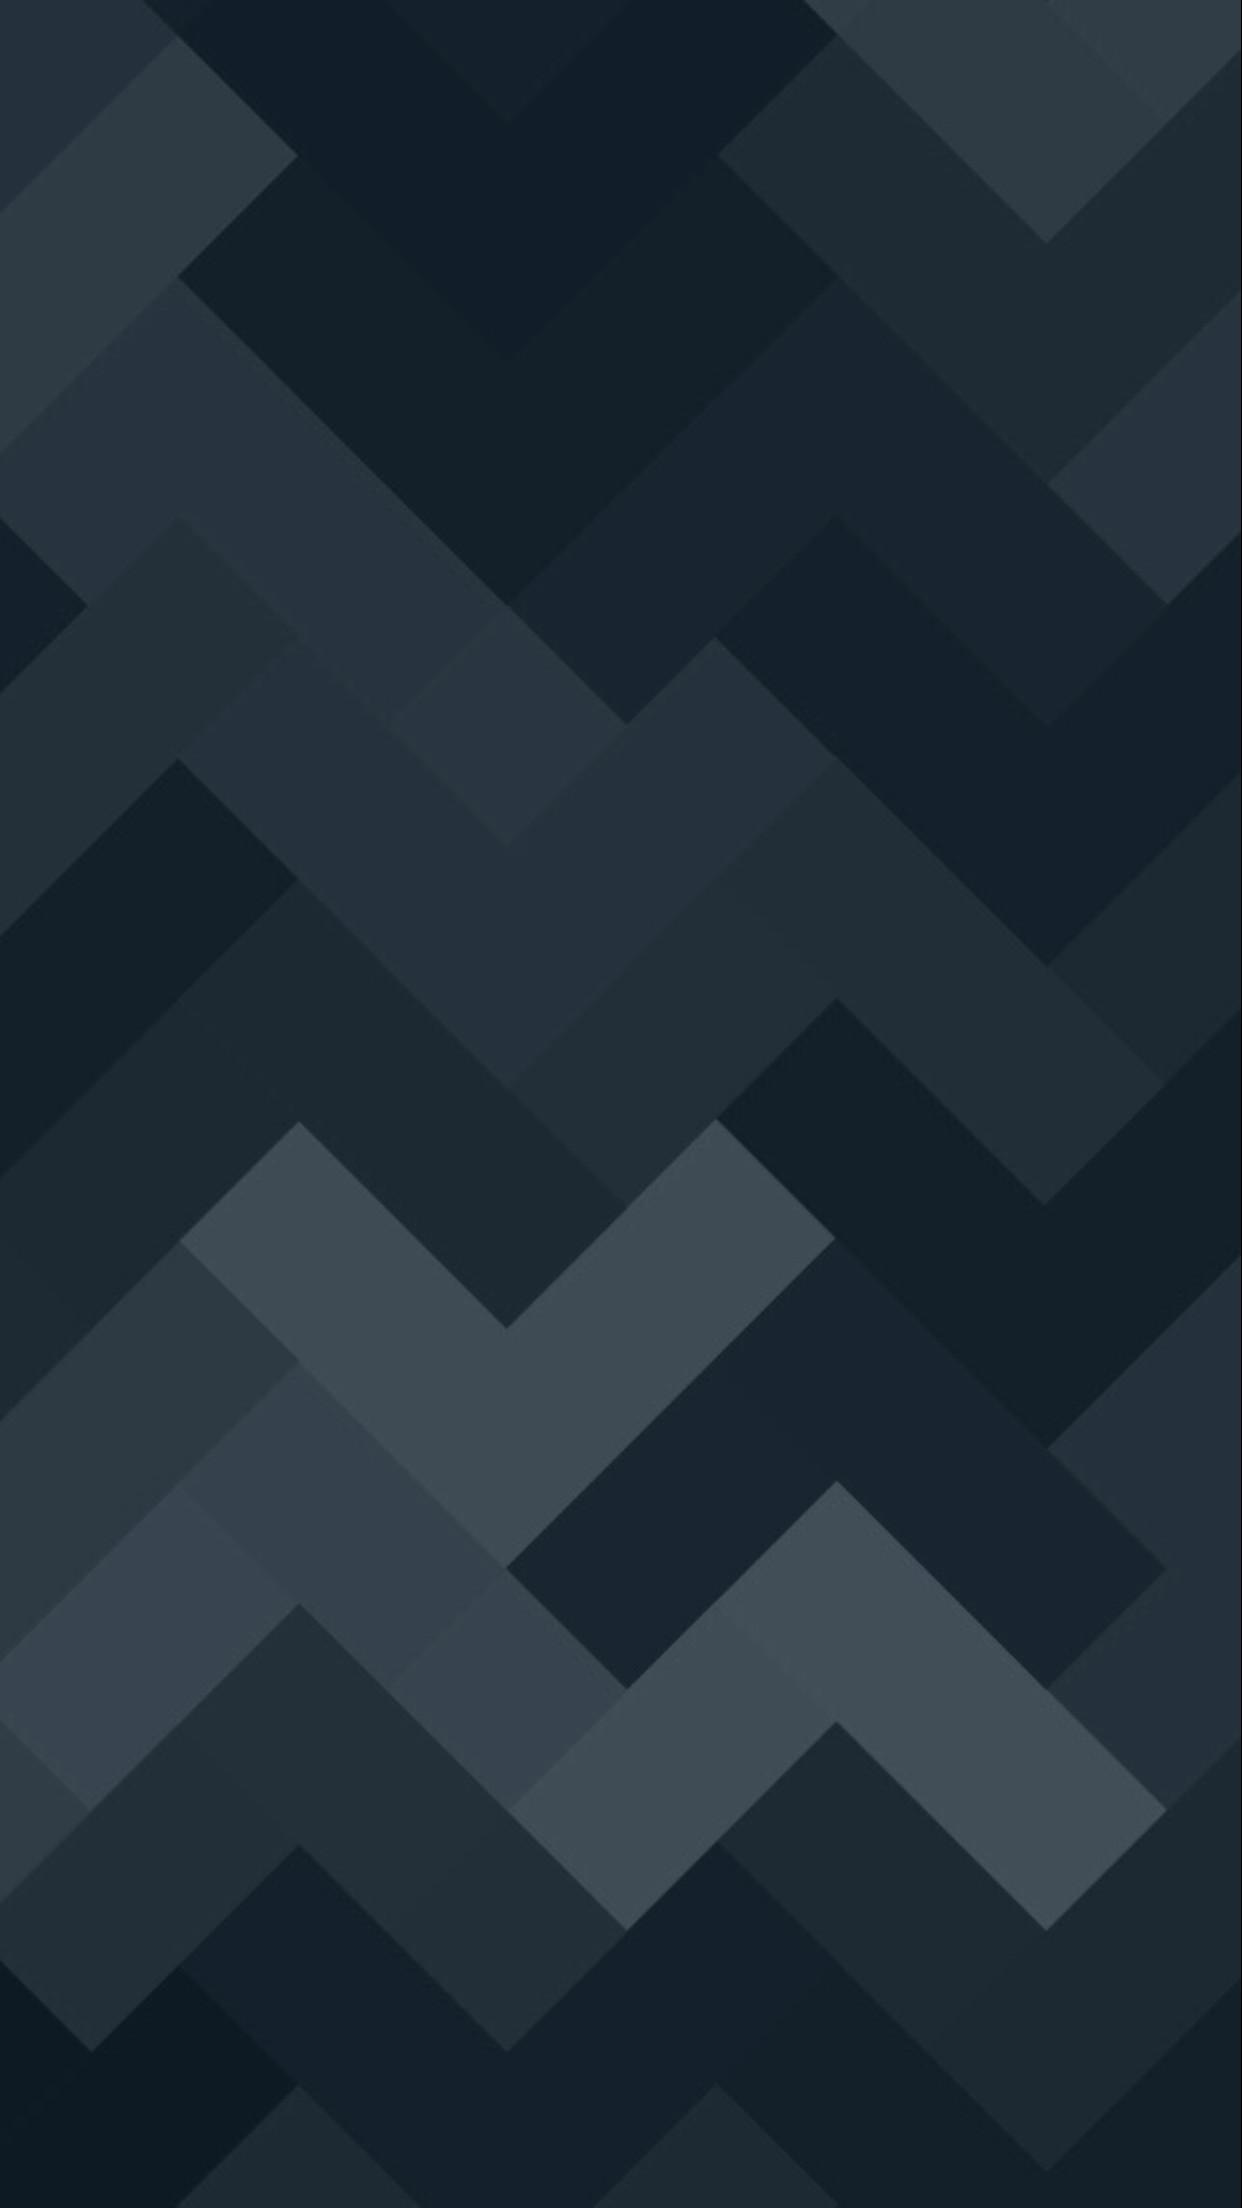 Shapes Black Wallpaper iPhone 6 Plus. Simple minimal points